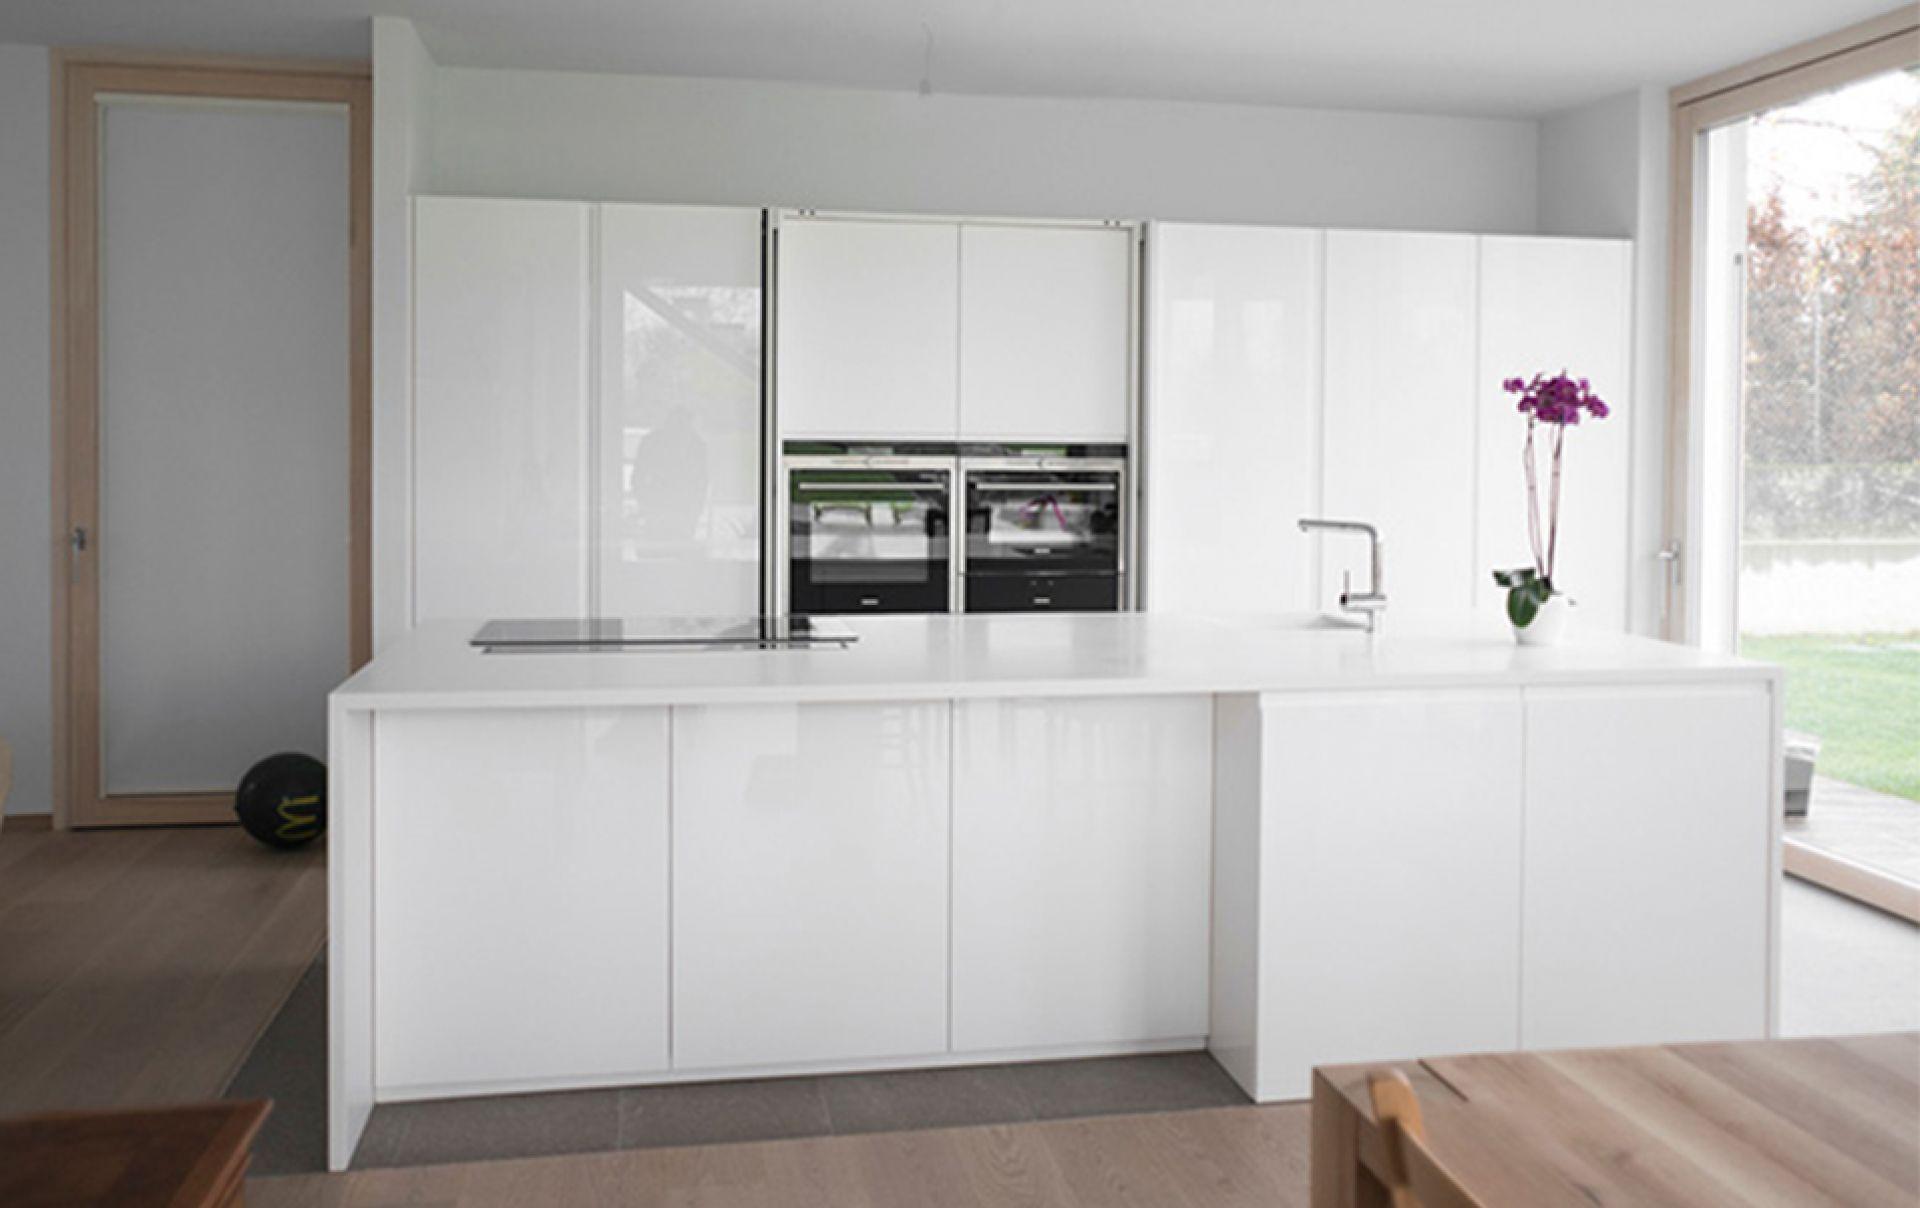 Immagini cucine componibili amazing zoom with immagini - Cucina componibile ikea ...